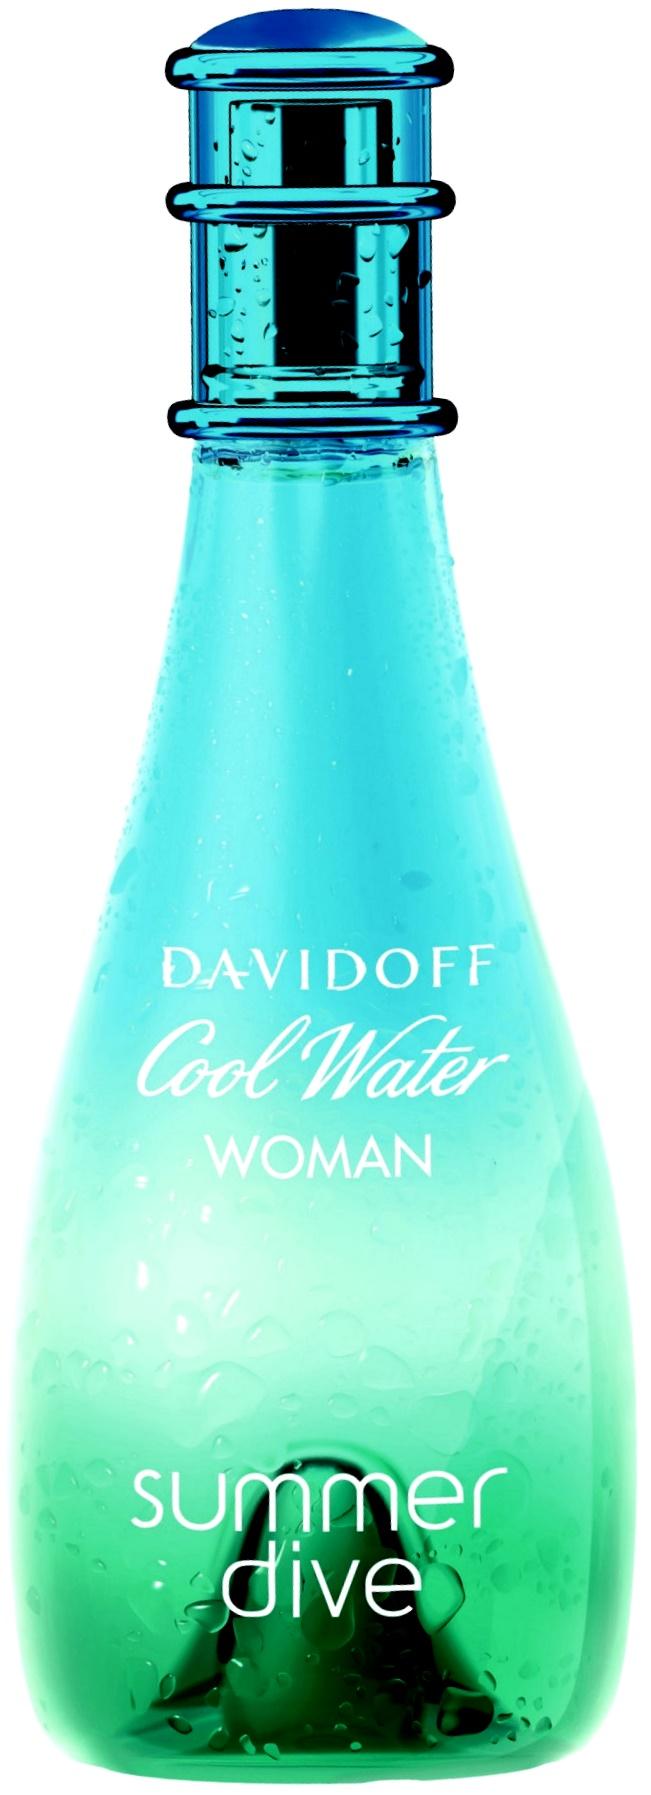 Парфюм echo woman davidoff, 50 мл